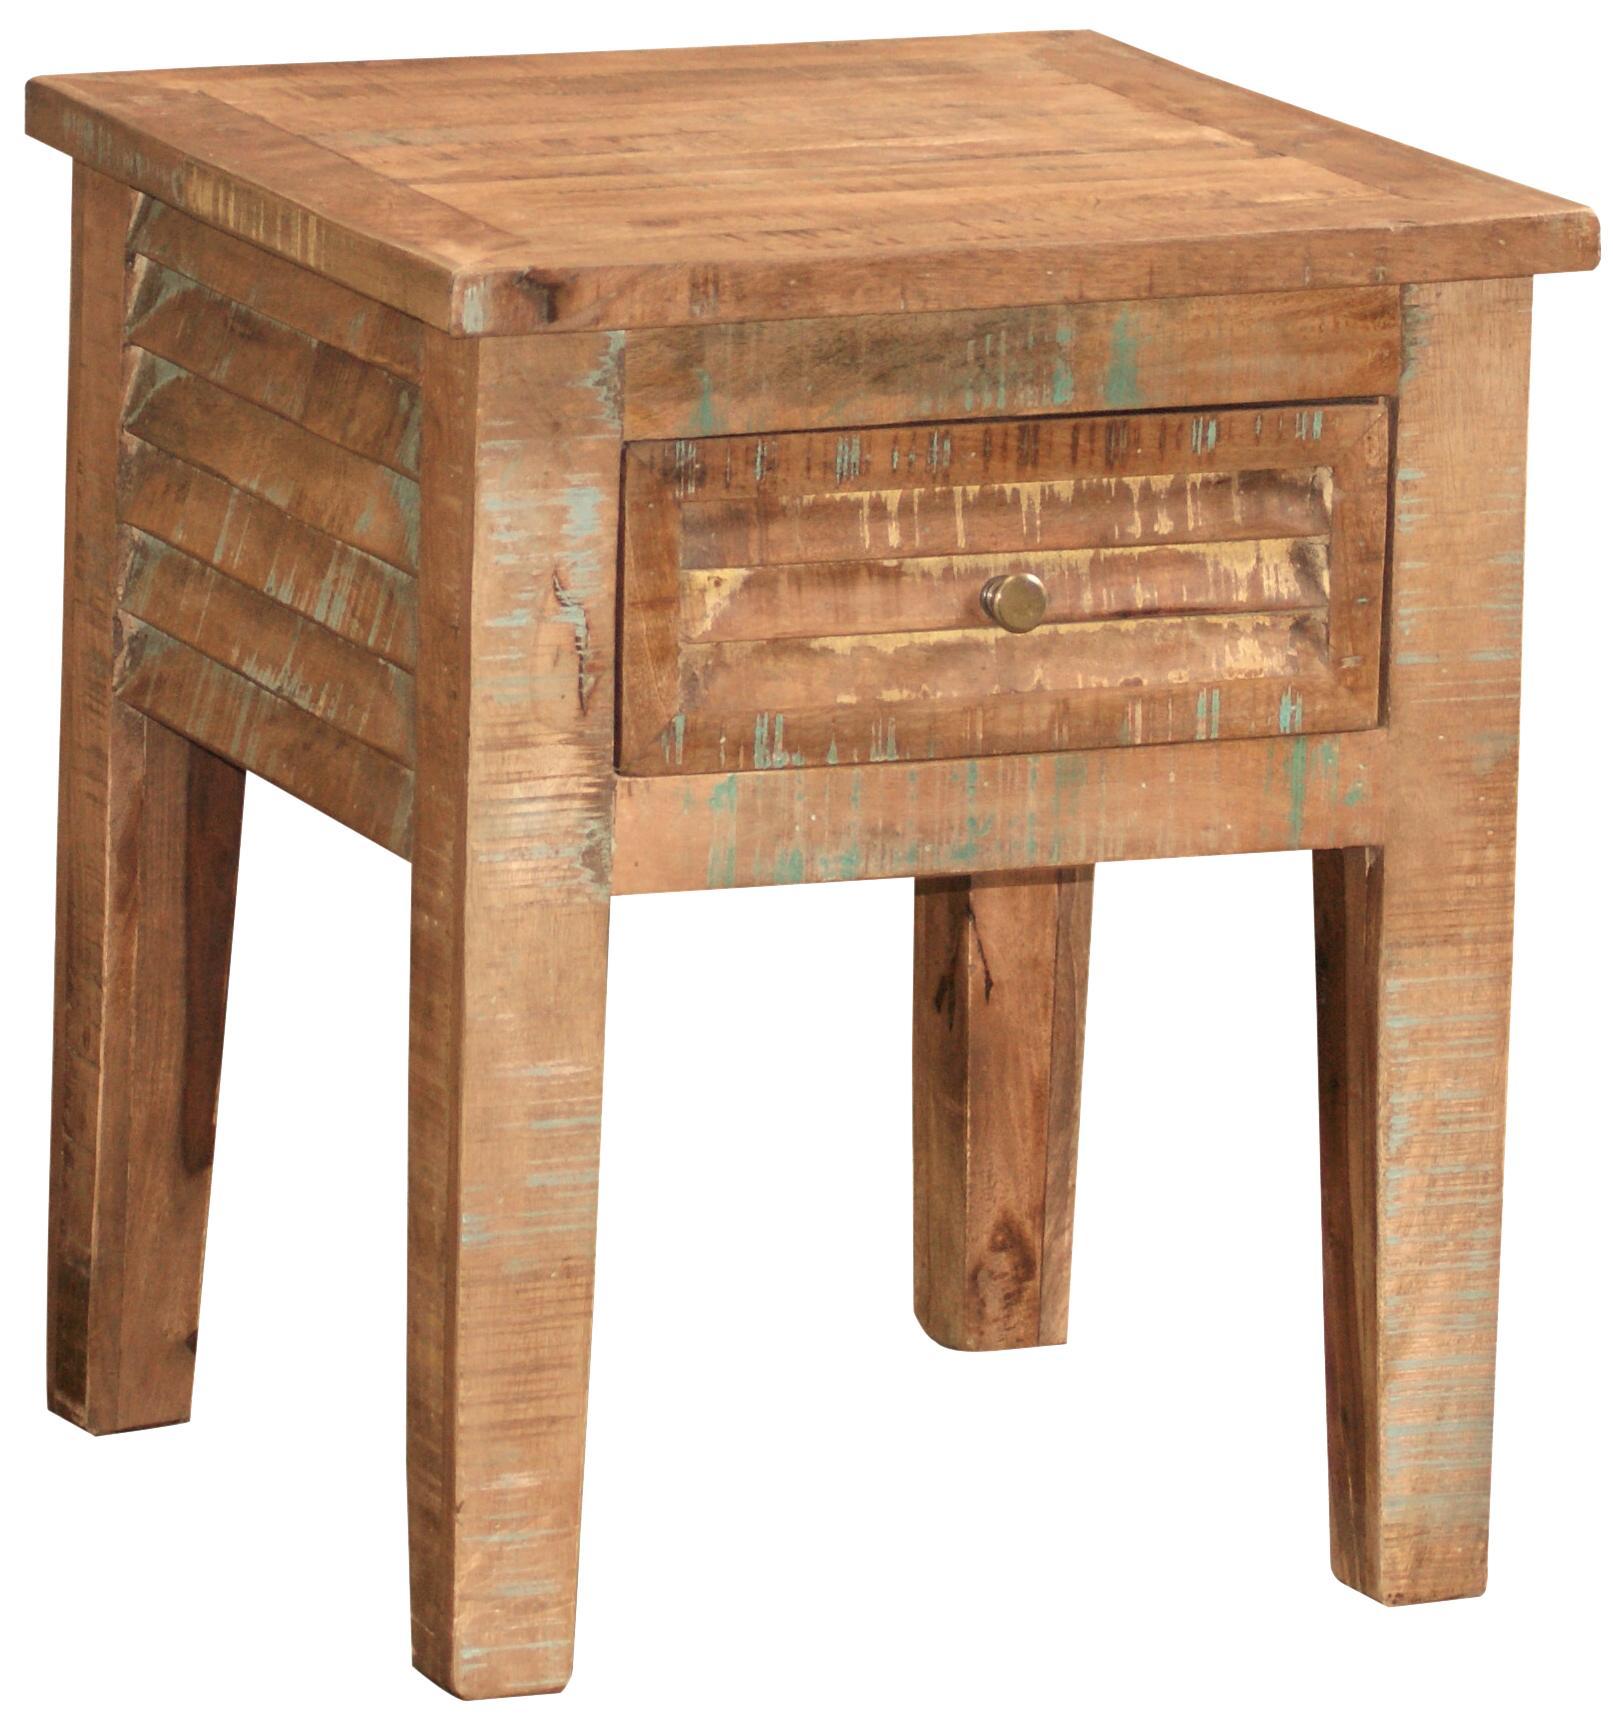 Morris Home Furnishings Morris Home Furnishings Bangladesh End Table - Item Number: GURU-84011